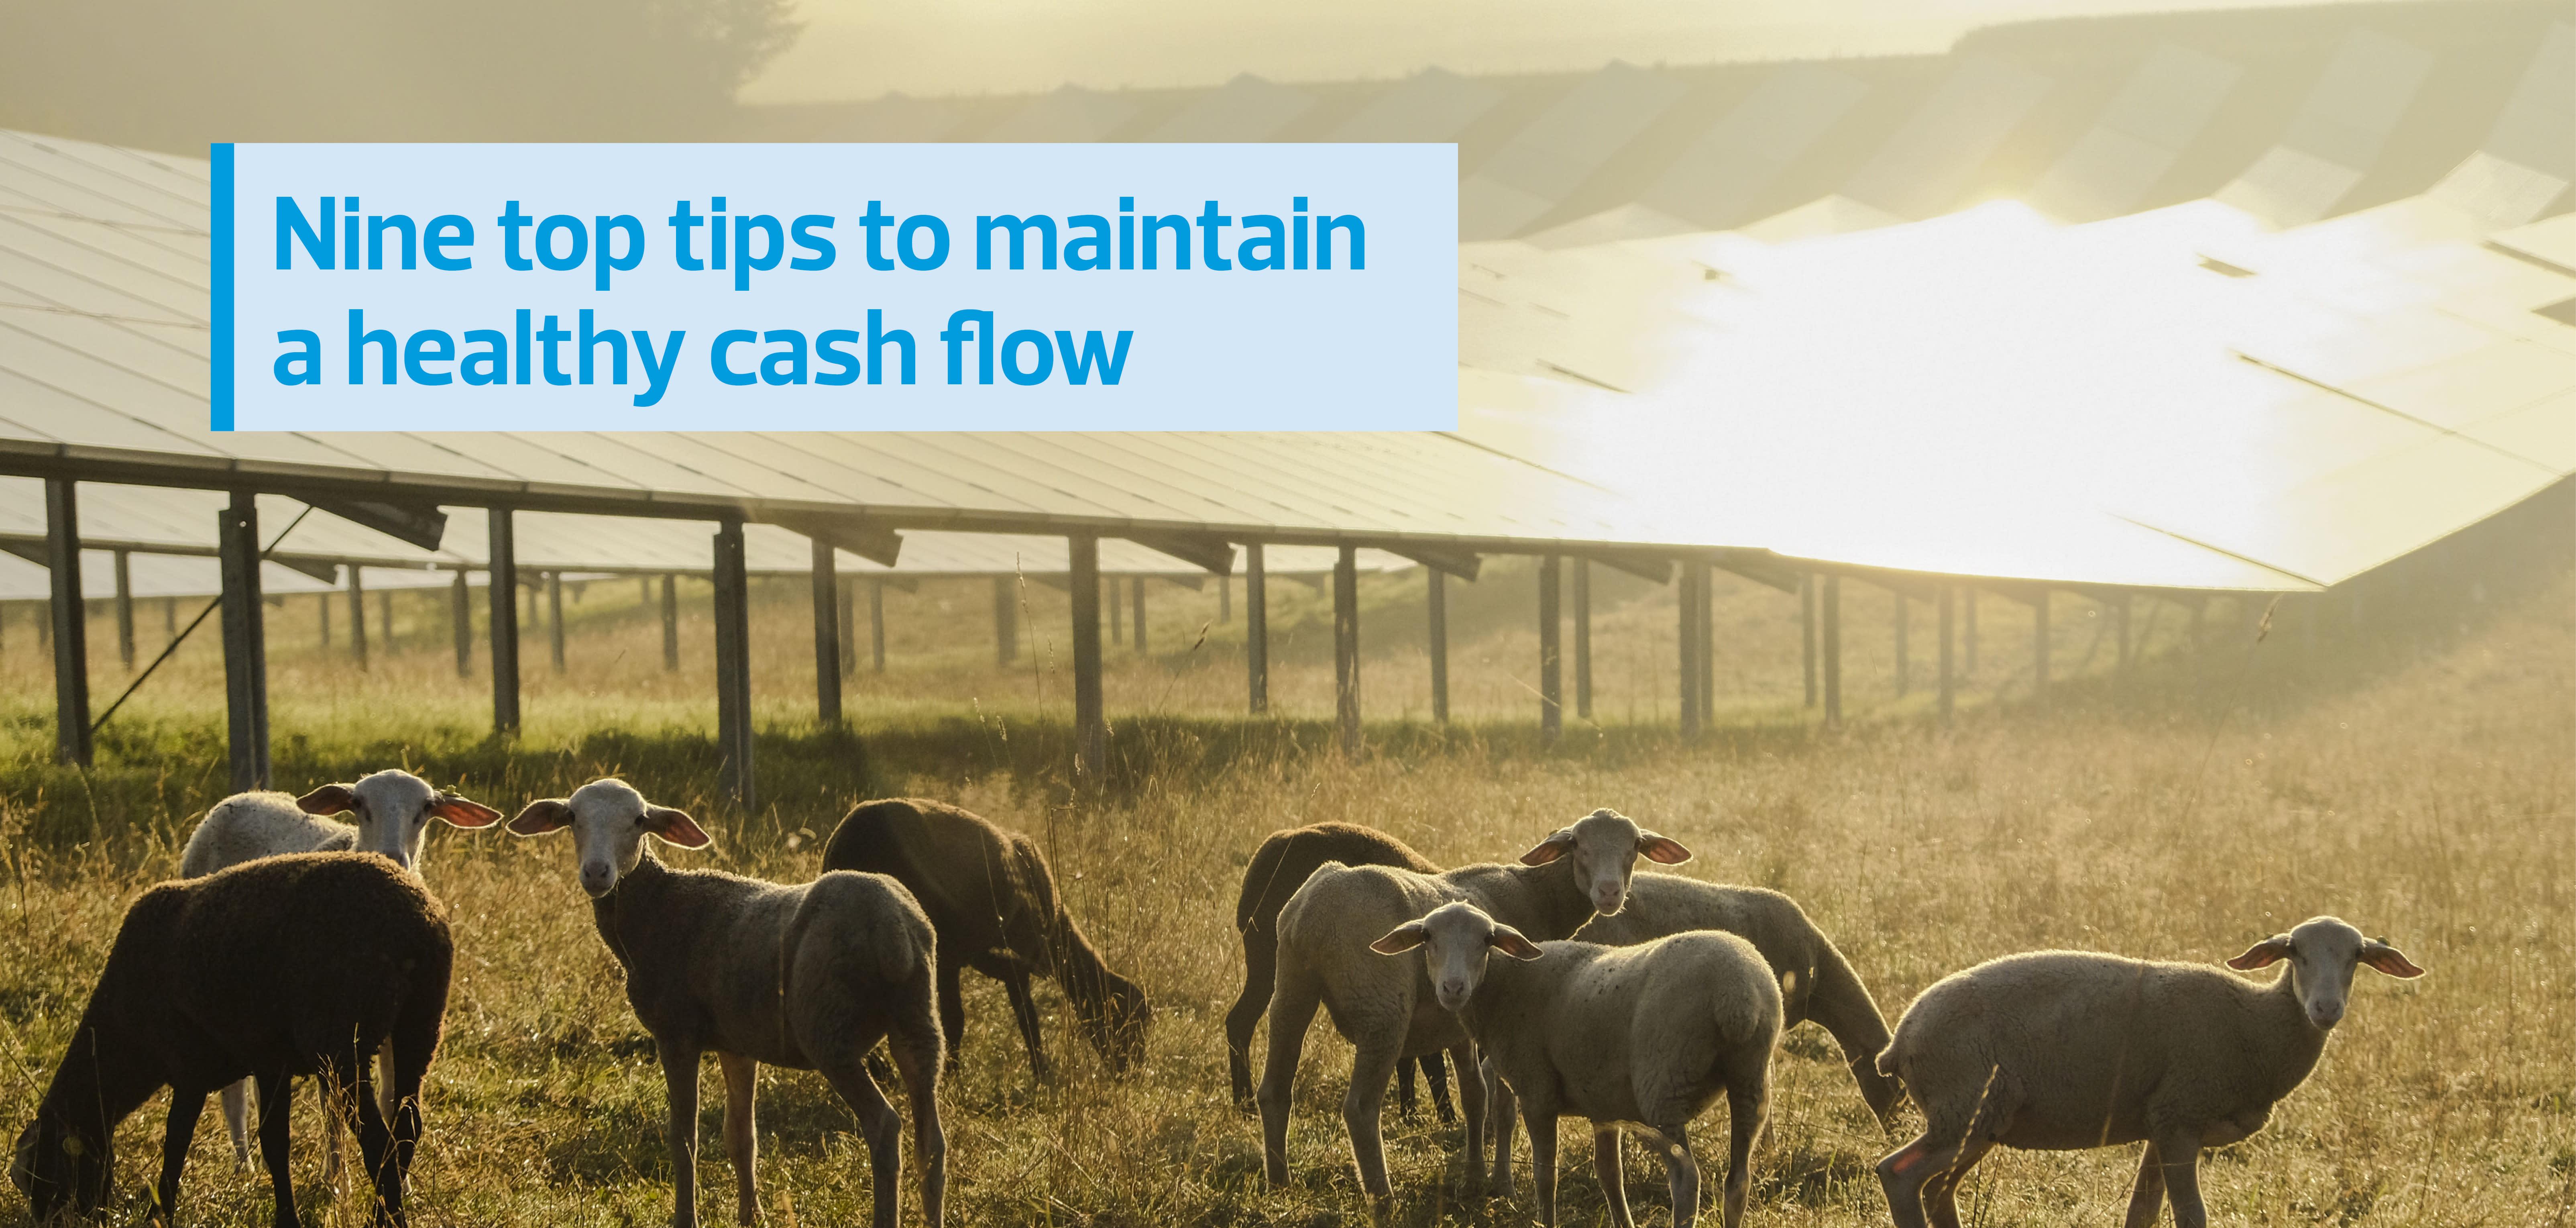 public://media/2020-08-27_nine_top_tips_to_maintain_a_healthy_cash_flow_thumbnail.jpg